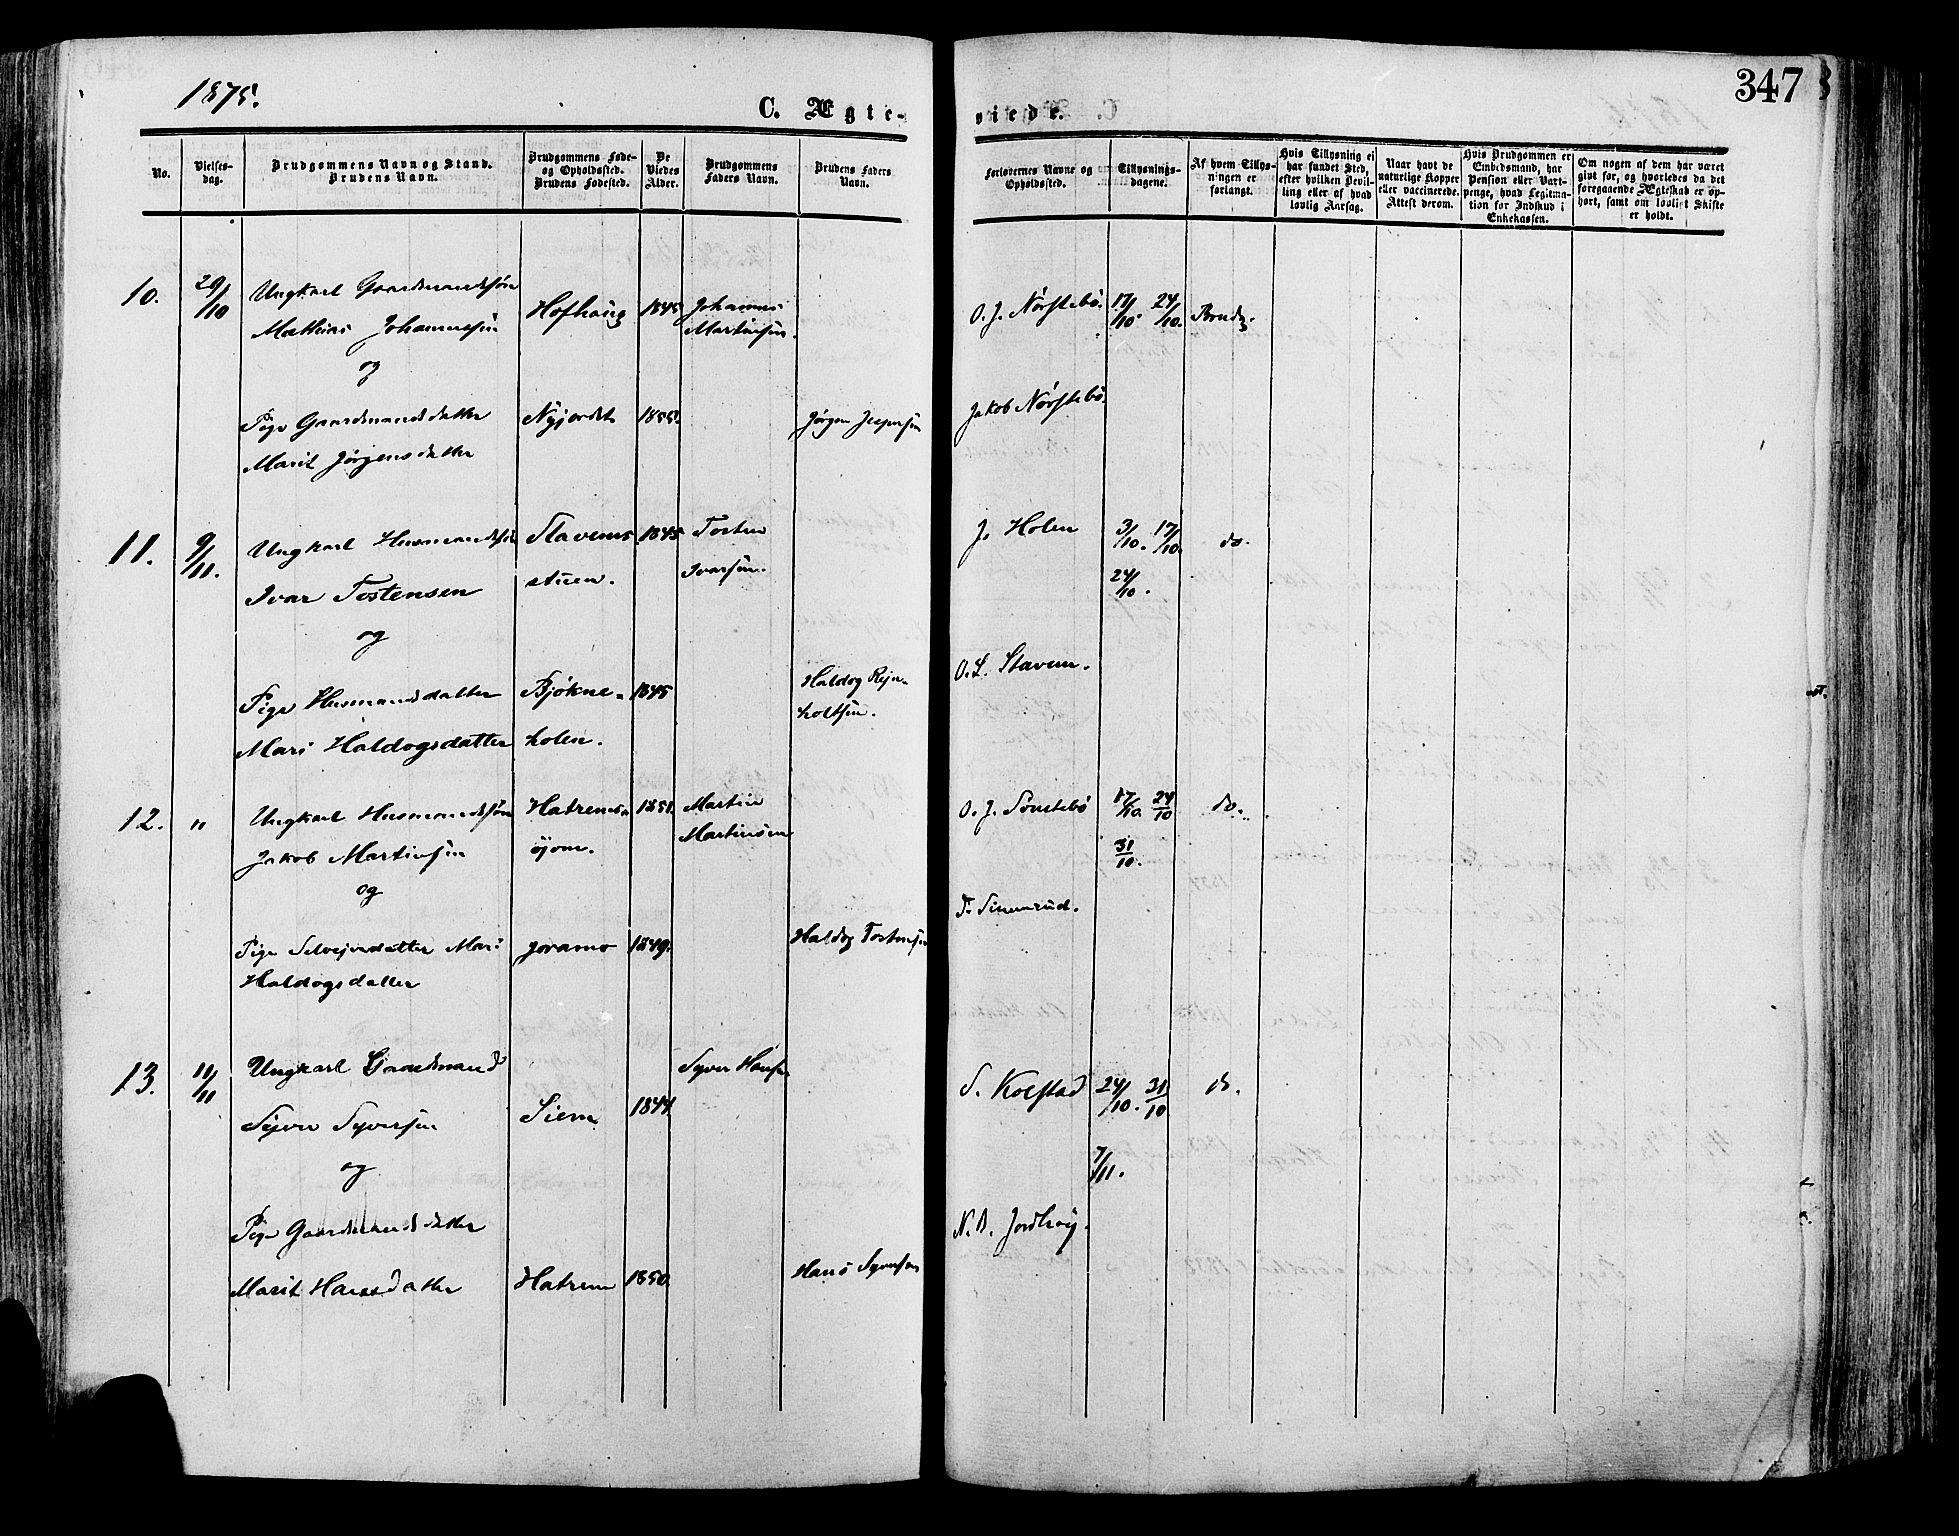 SAH, Lesja prestekontor, Ministerialbok nr. 8, 1854-1880, s. 347